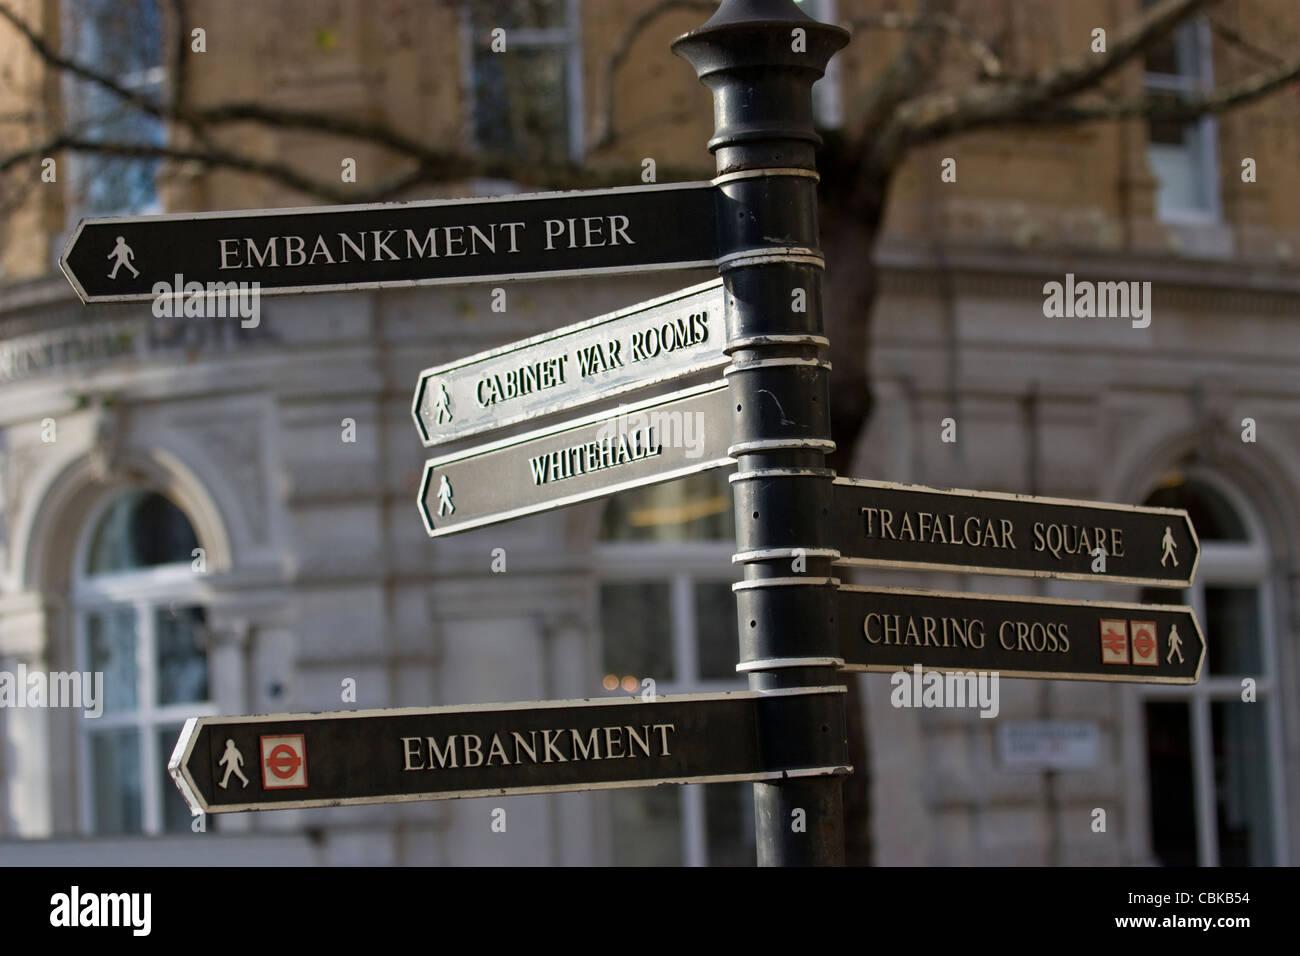 London direction sign, for embankment pier, cabinet war rooms, whitehall, embankment, trafalgar square, Charing - Stock Image